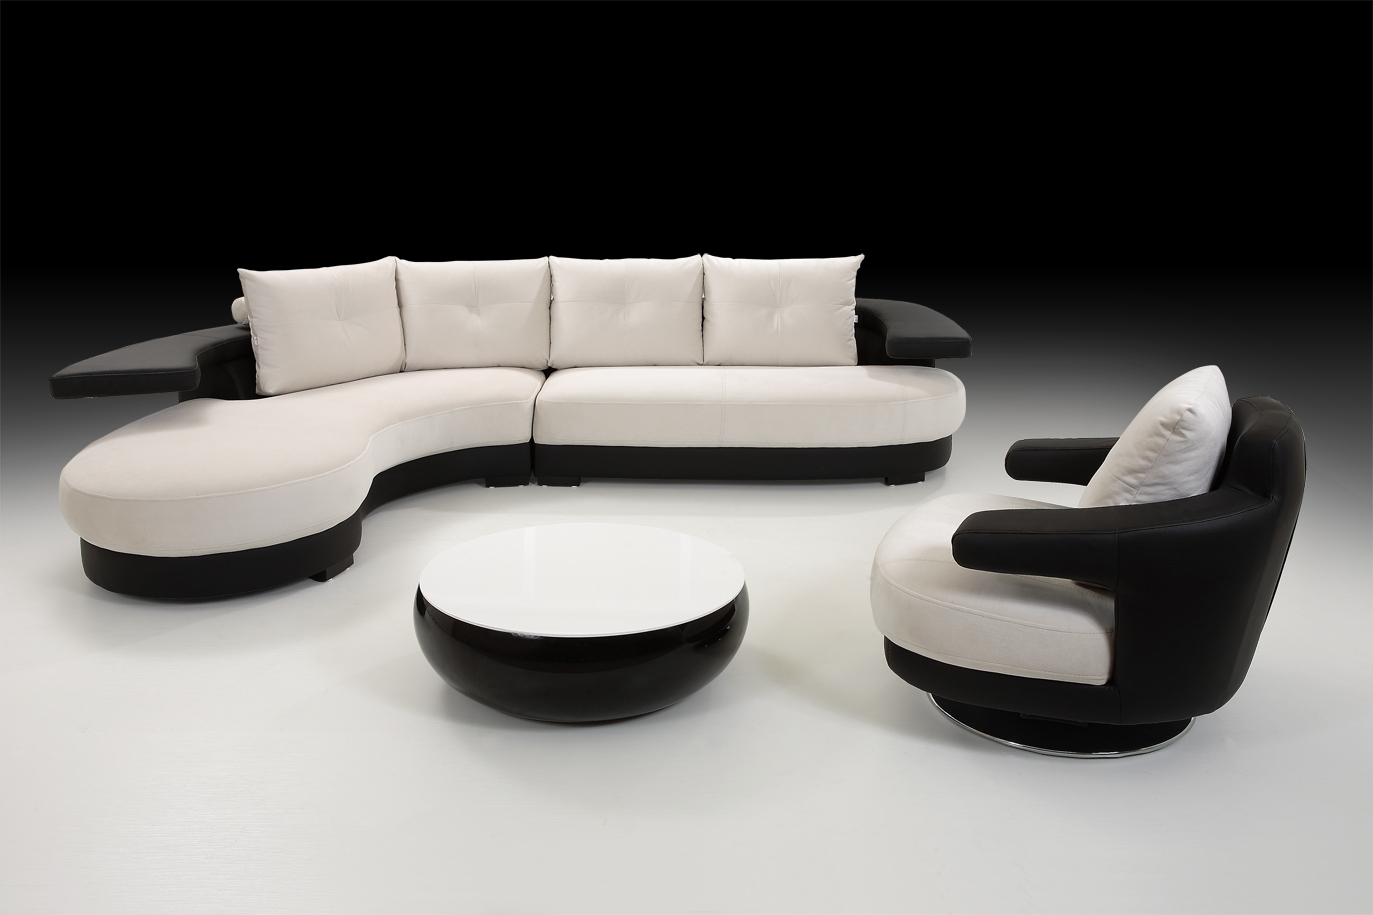 Favorite Sofas: Black White Corner Sofa With Armchair And Stool, Black Pertaining To Black And White Sofas (View 11 of 15)